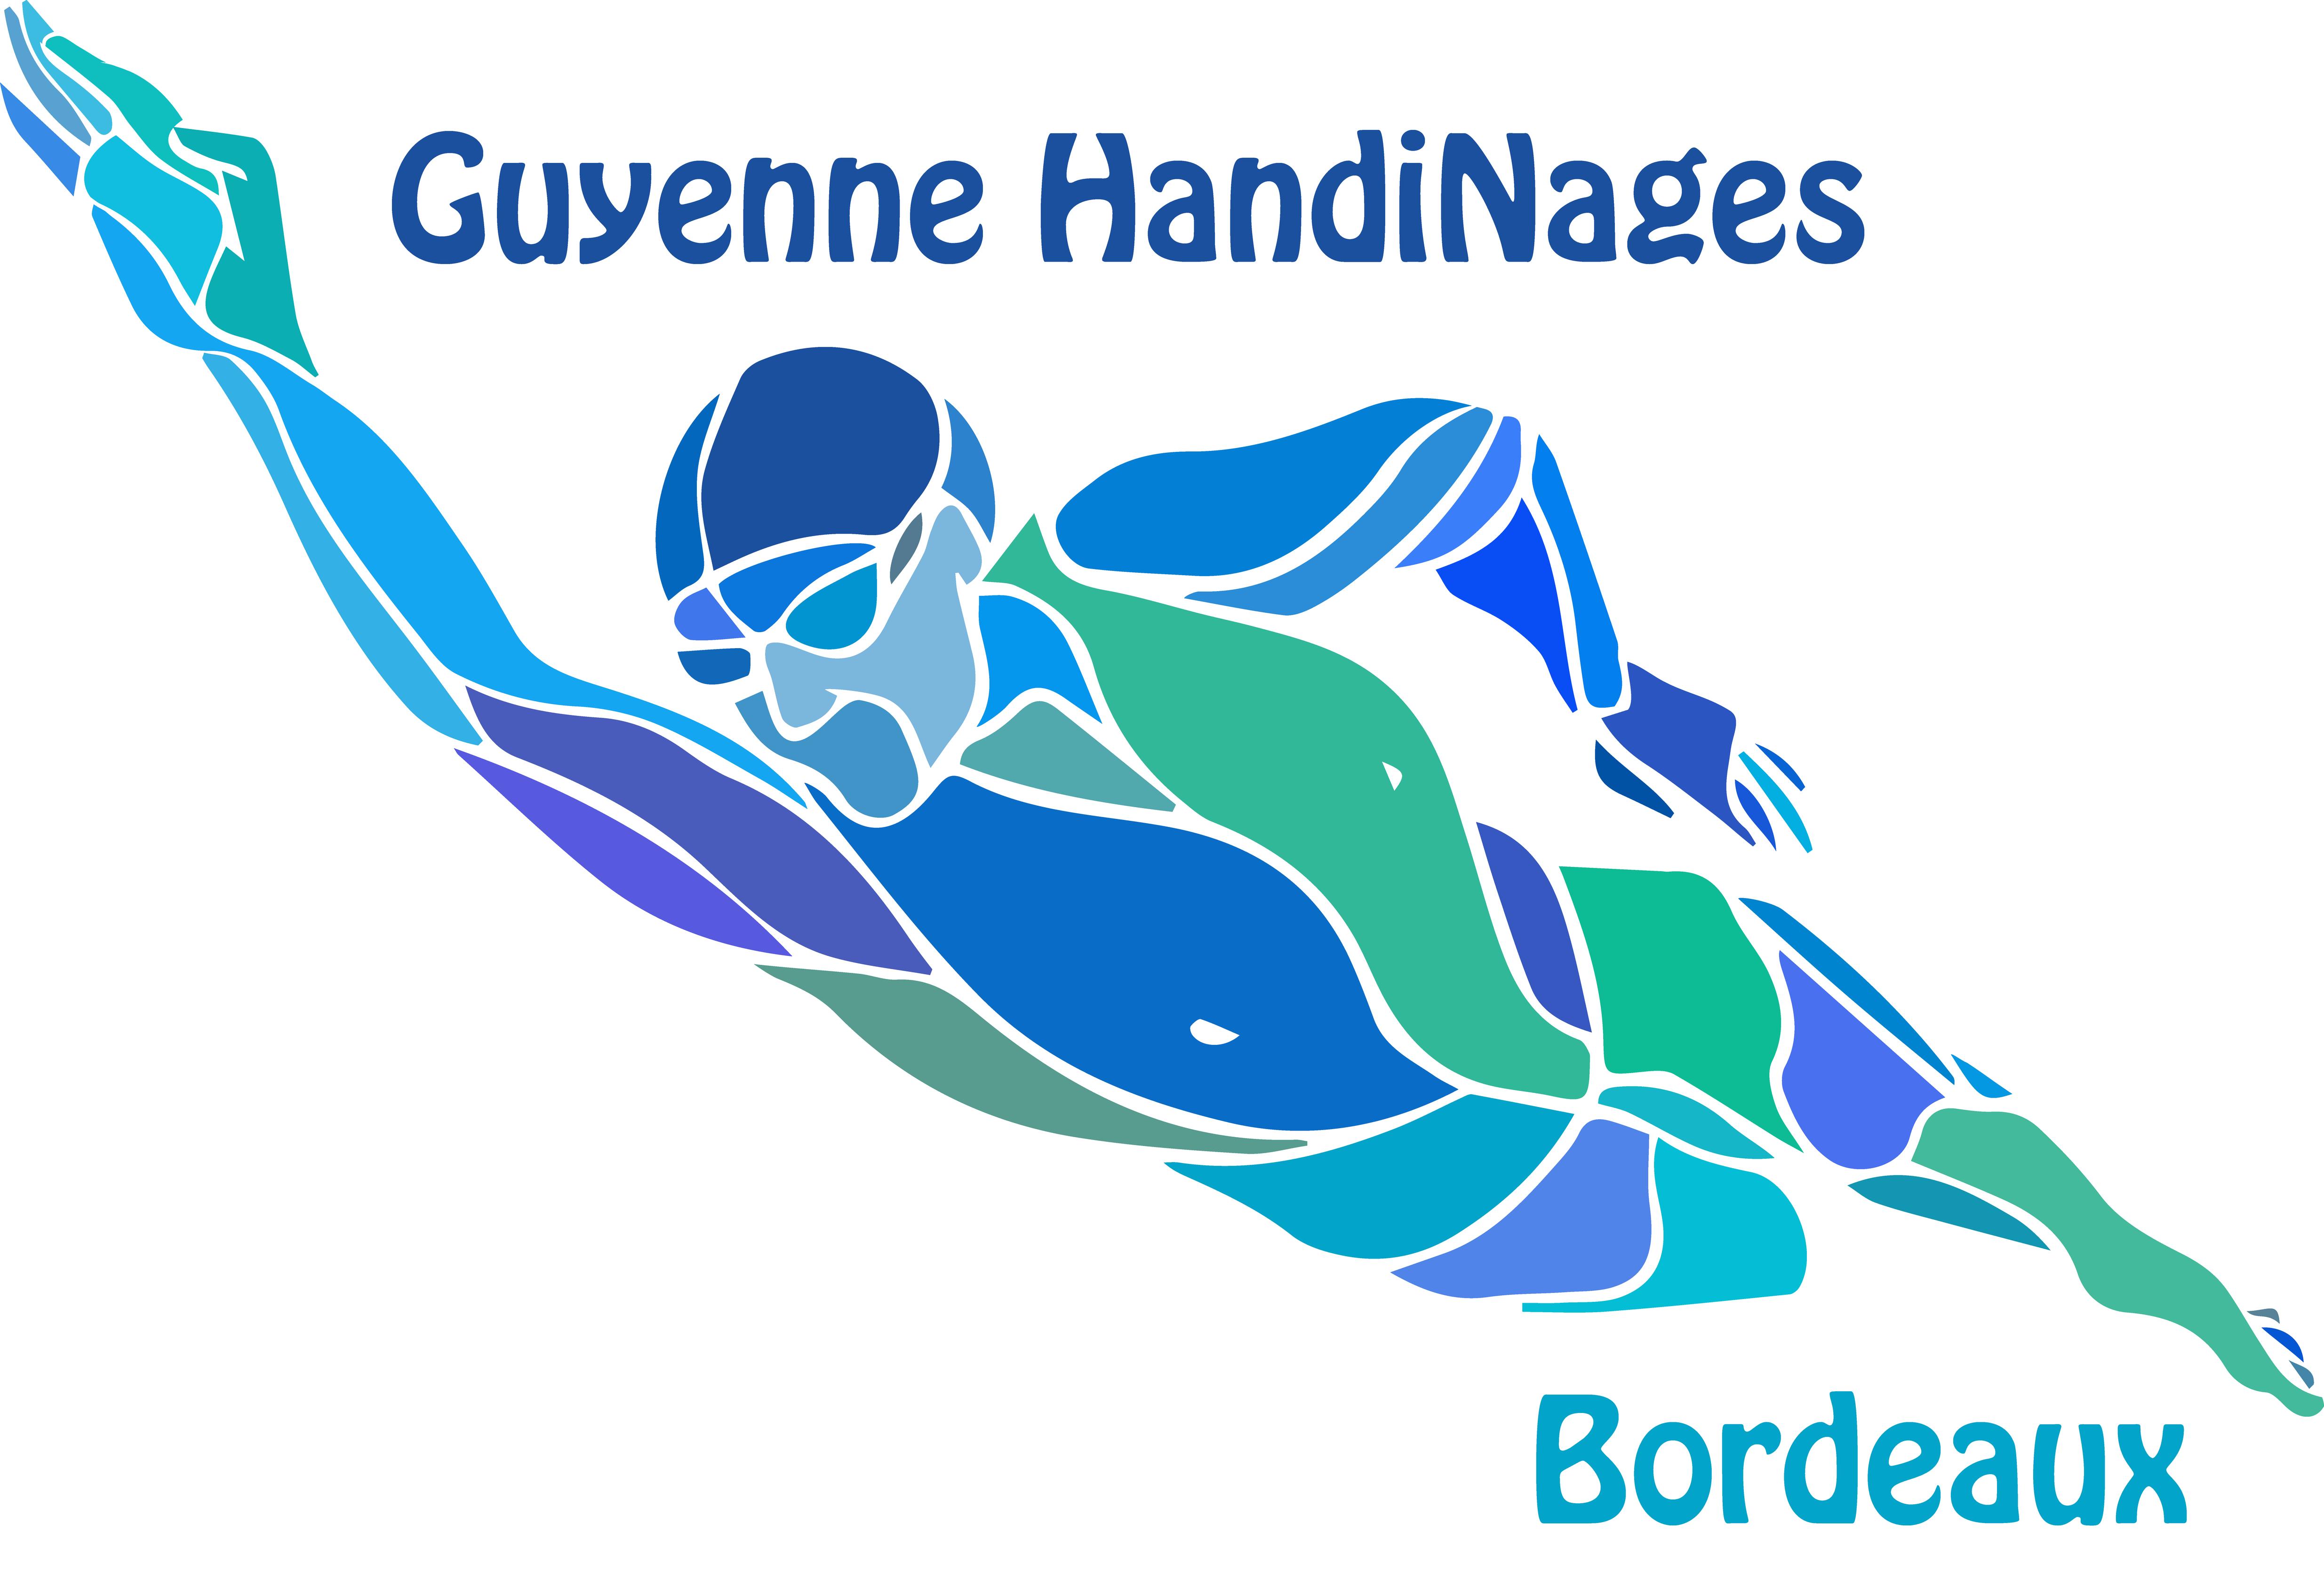 GUYENNE HANDINAGES